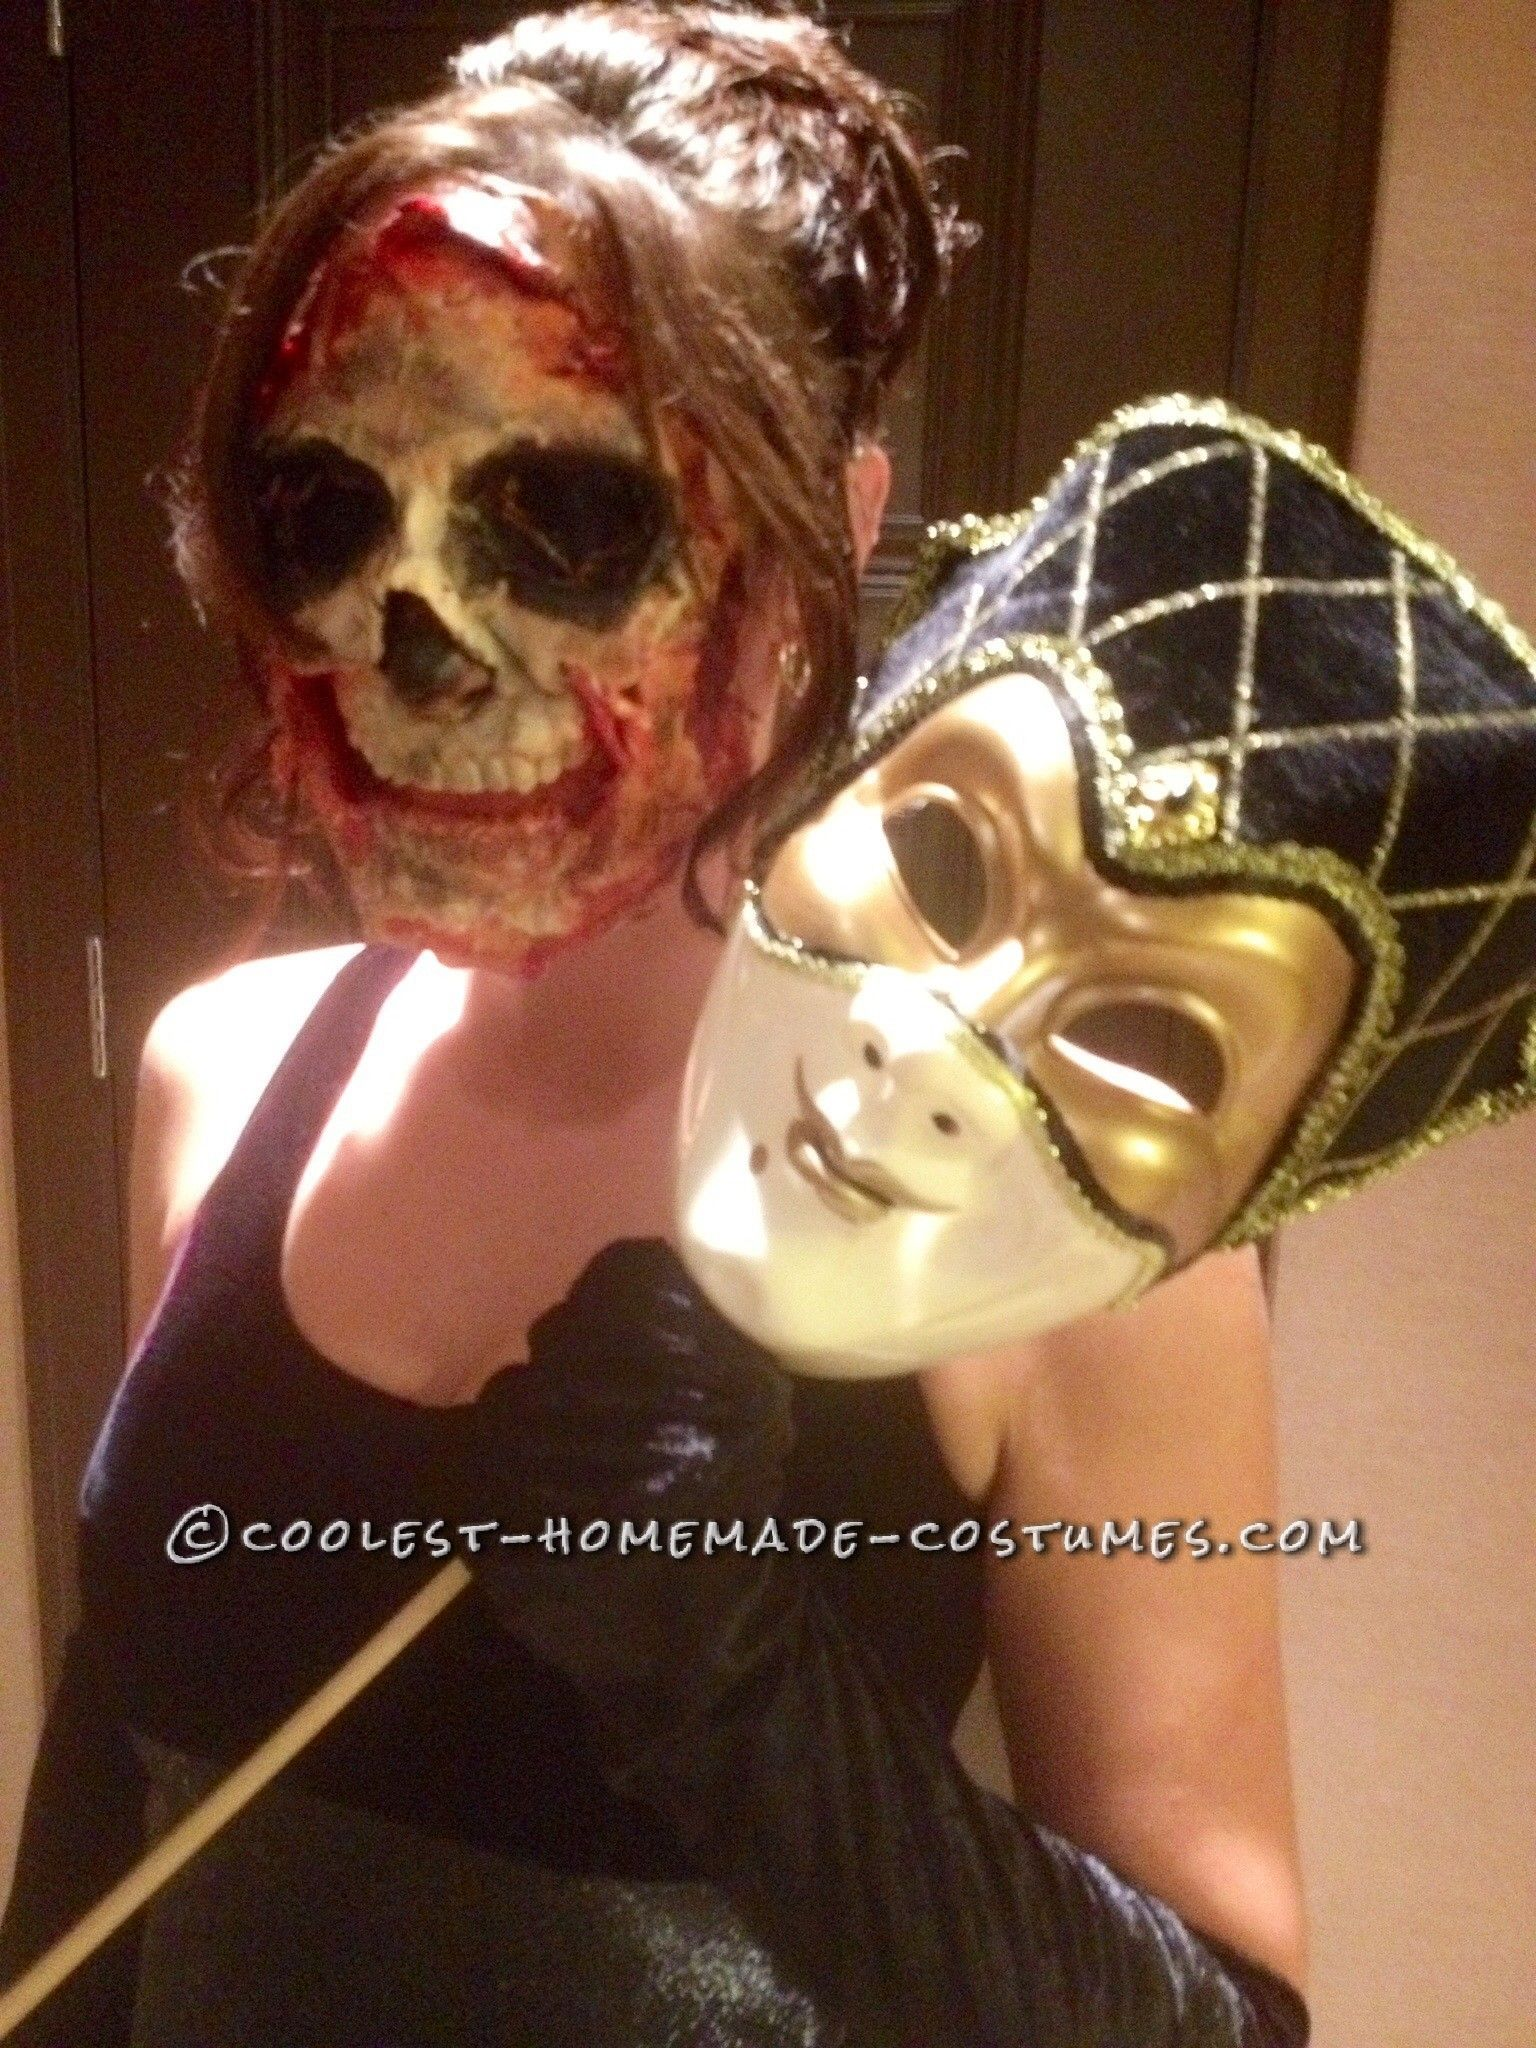 creepy super scary masquerade women's costume | coolest homemade